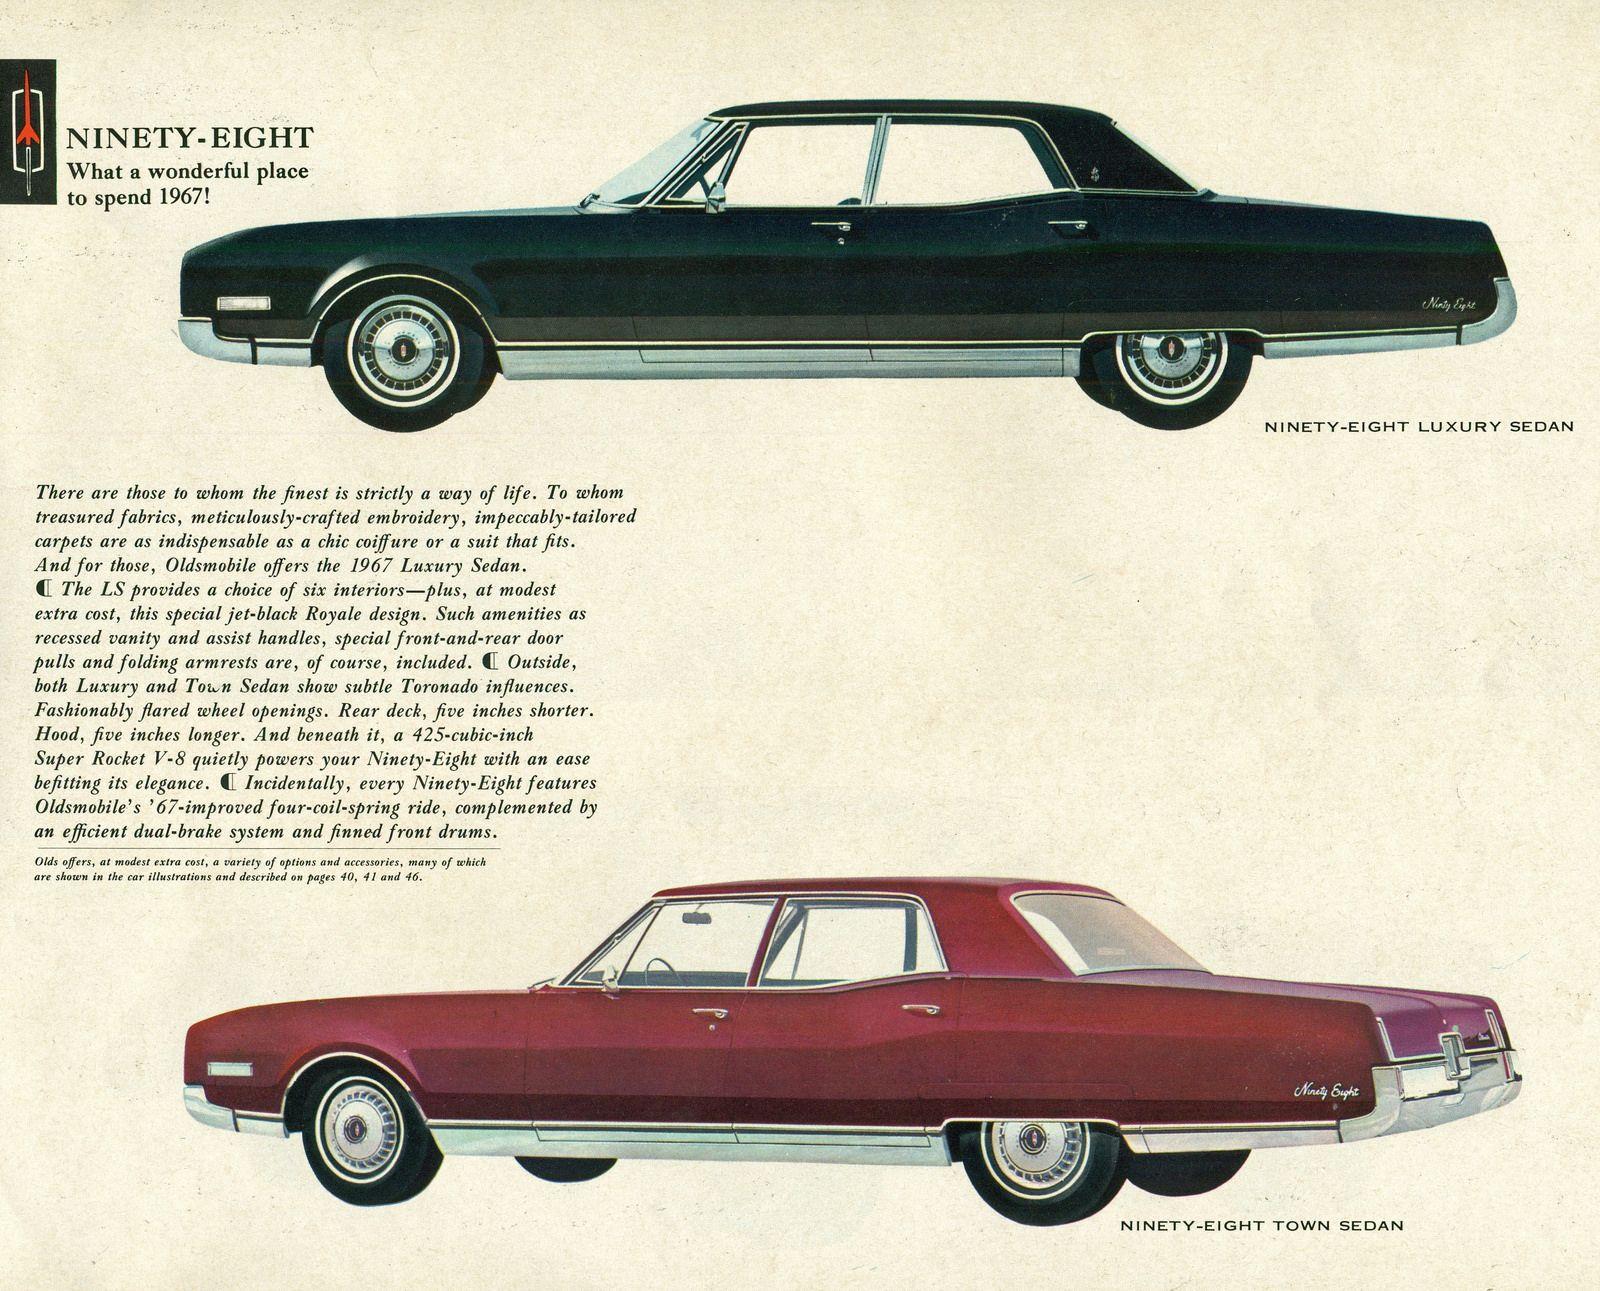 1967 Oldsmobile Ninety Eight Holiday Luxury Sedan And Holiday Sedan Oldsmobile Car Brochure Car Advertising